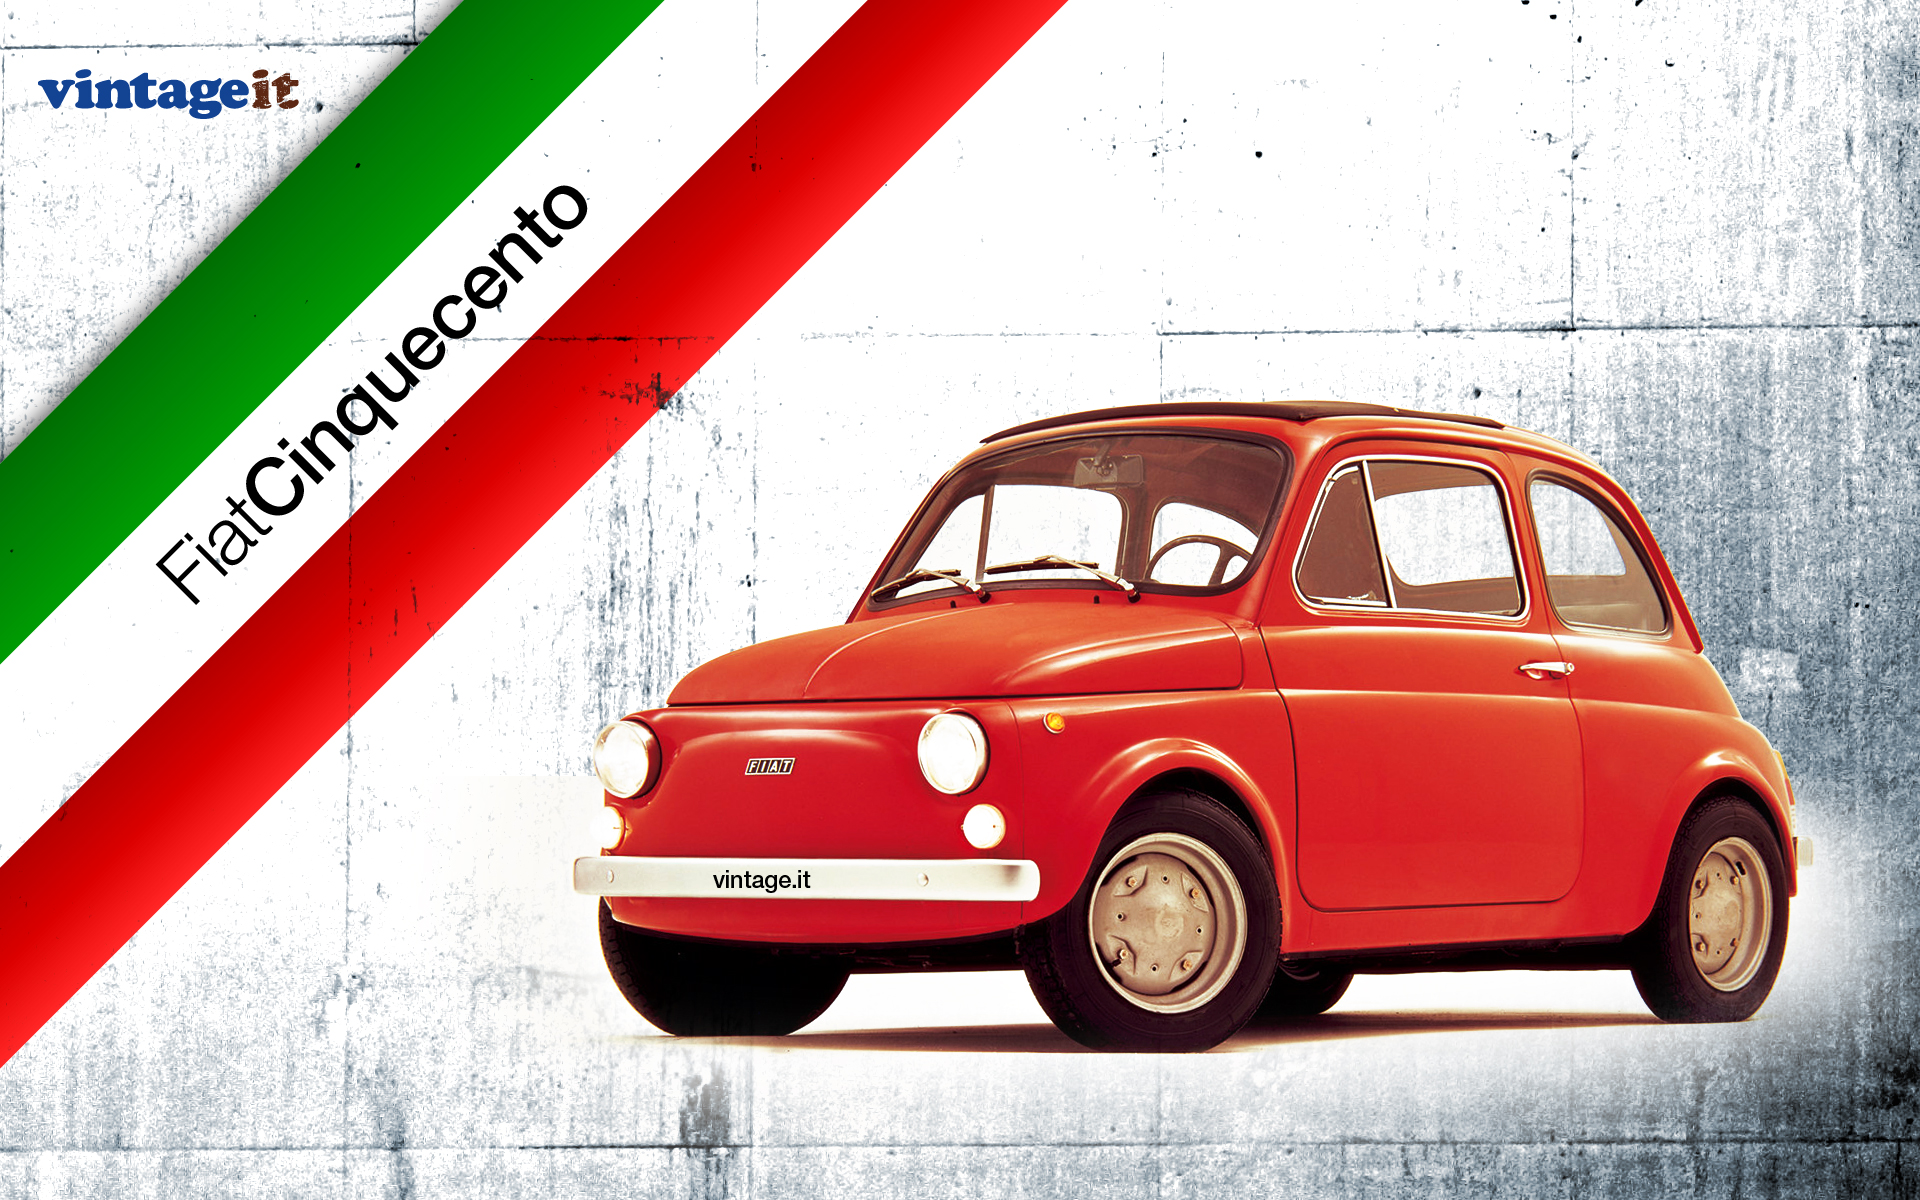 Fiat 500 Wallpaper 19   1920 X 1200 stmednet 1920x1200